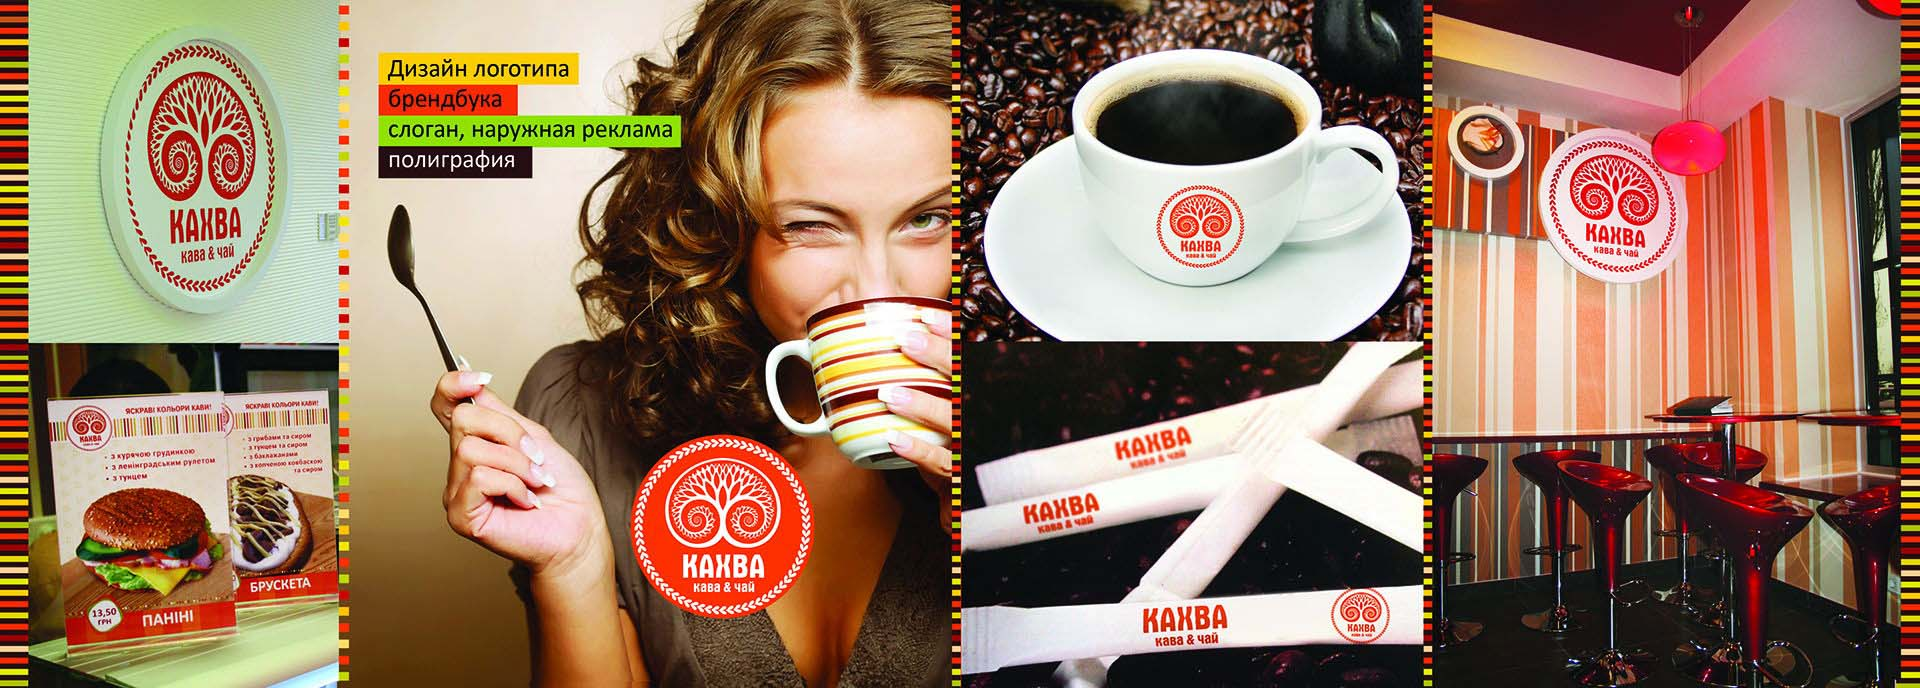 дизайн логотипа кафе